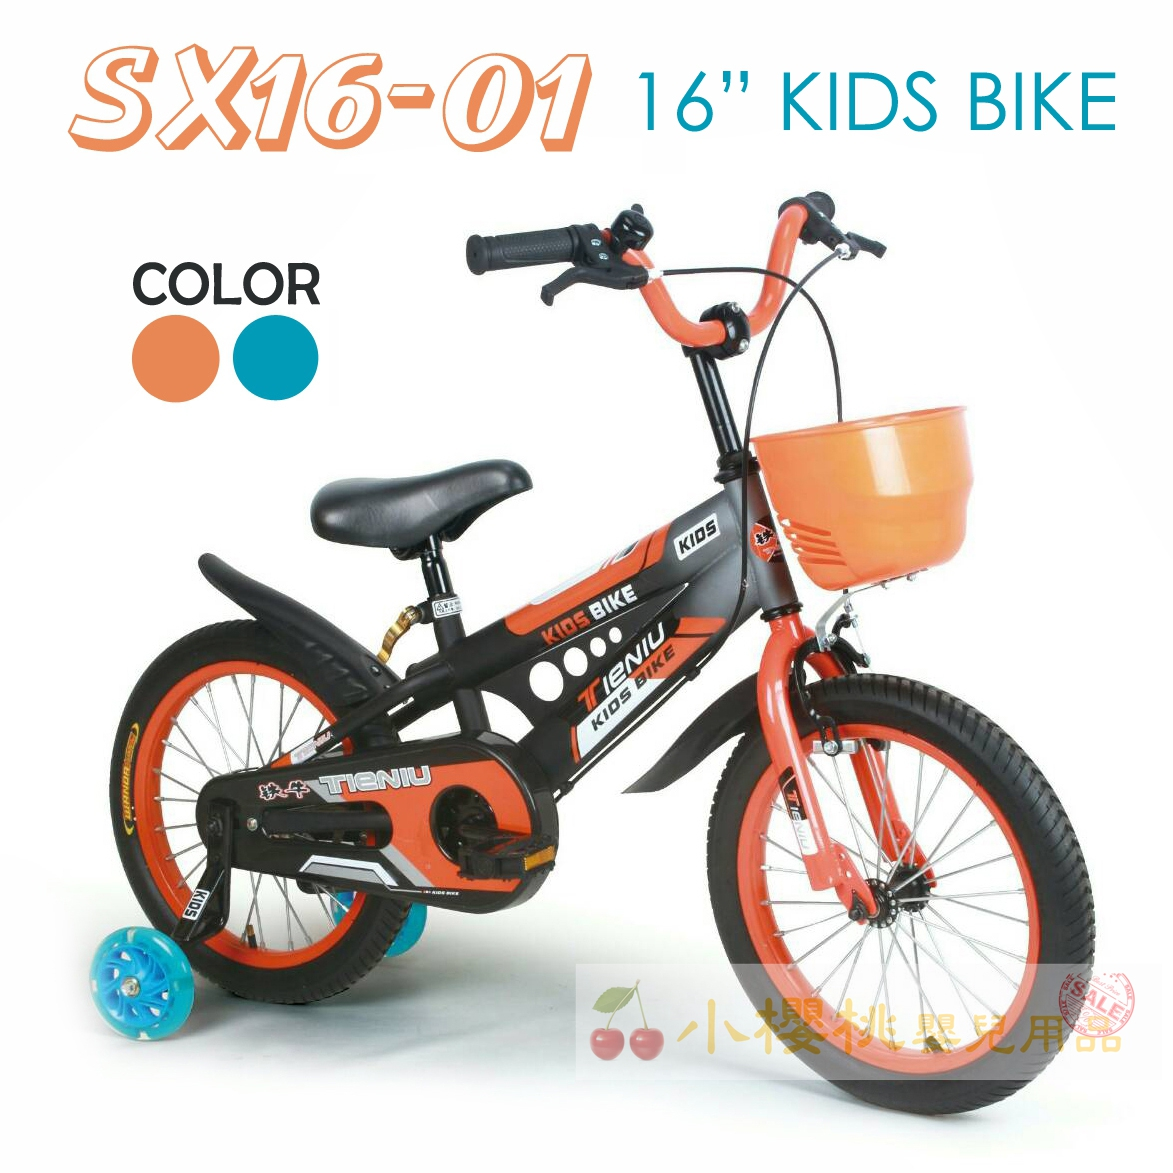 CHINH-CHING親親--寶可精靈腳踏車 16吋兒童腳踏車 【SX16-01】兩色可選